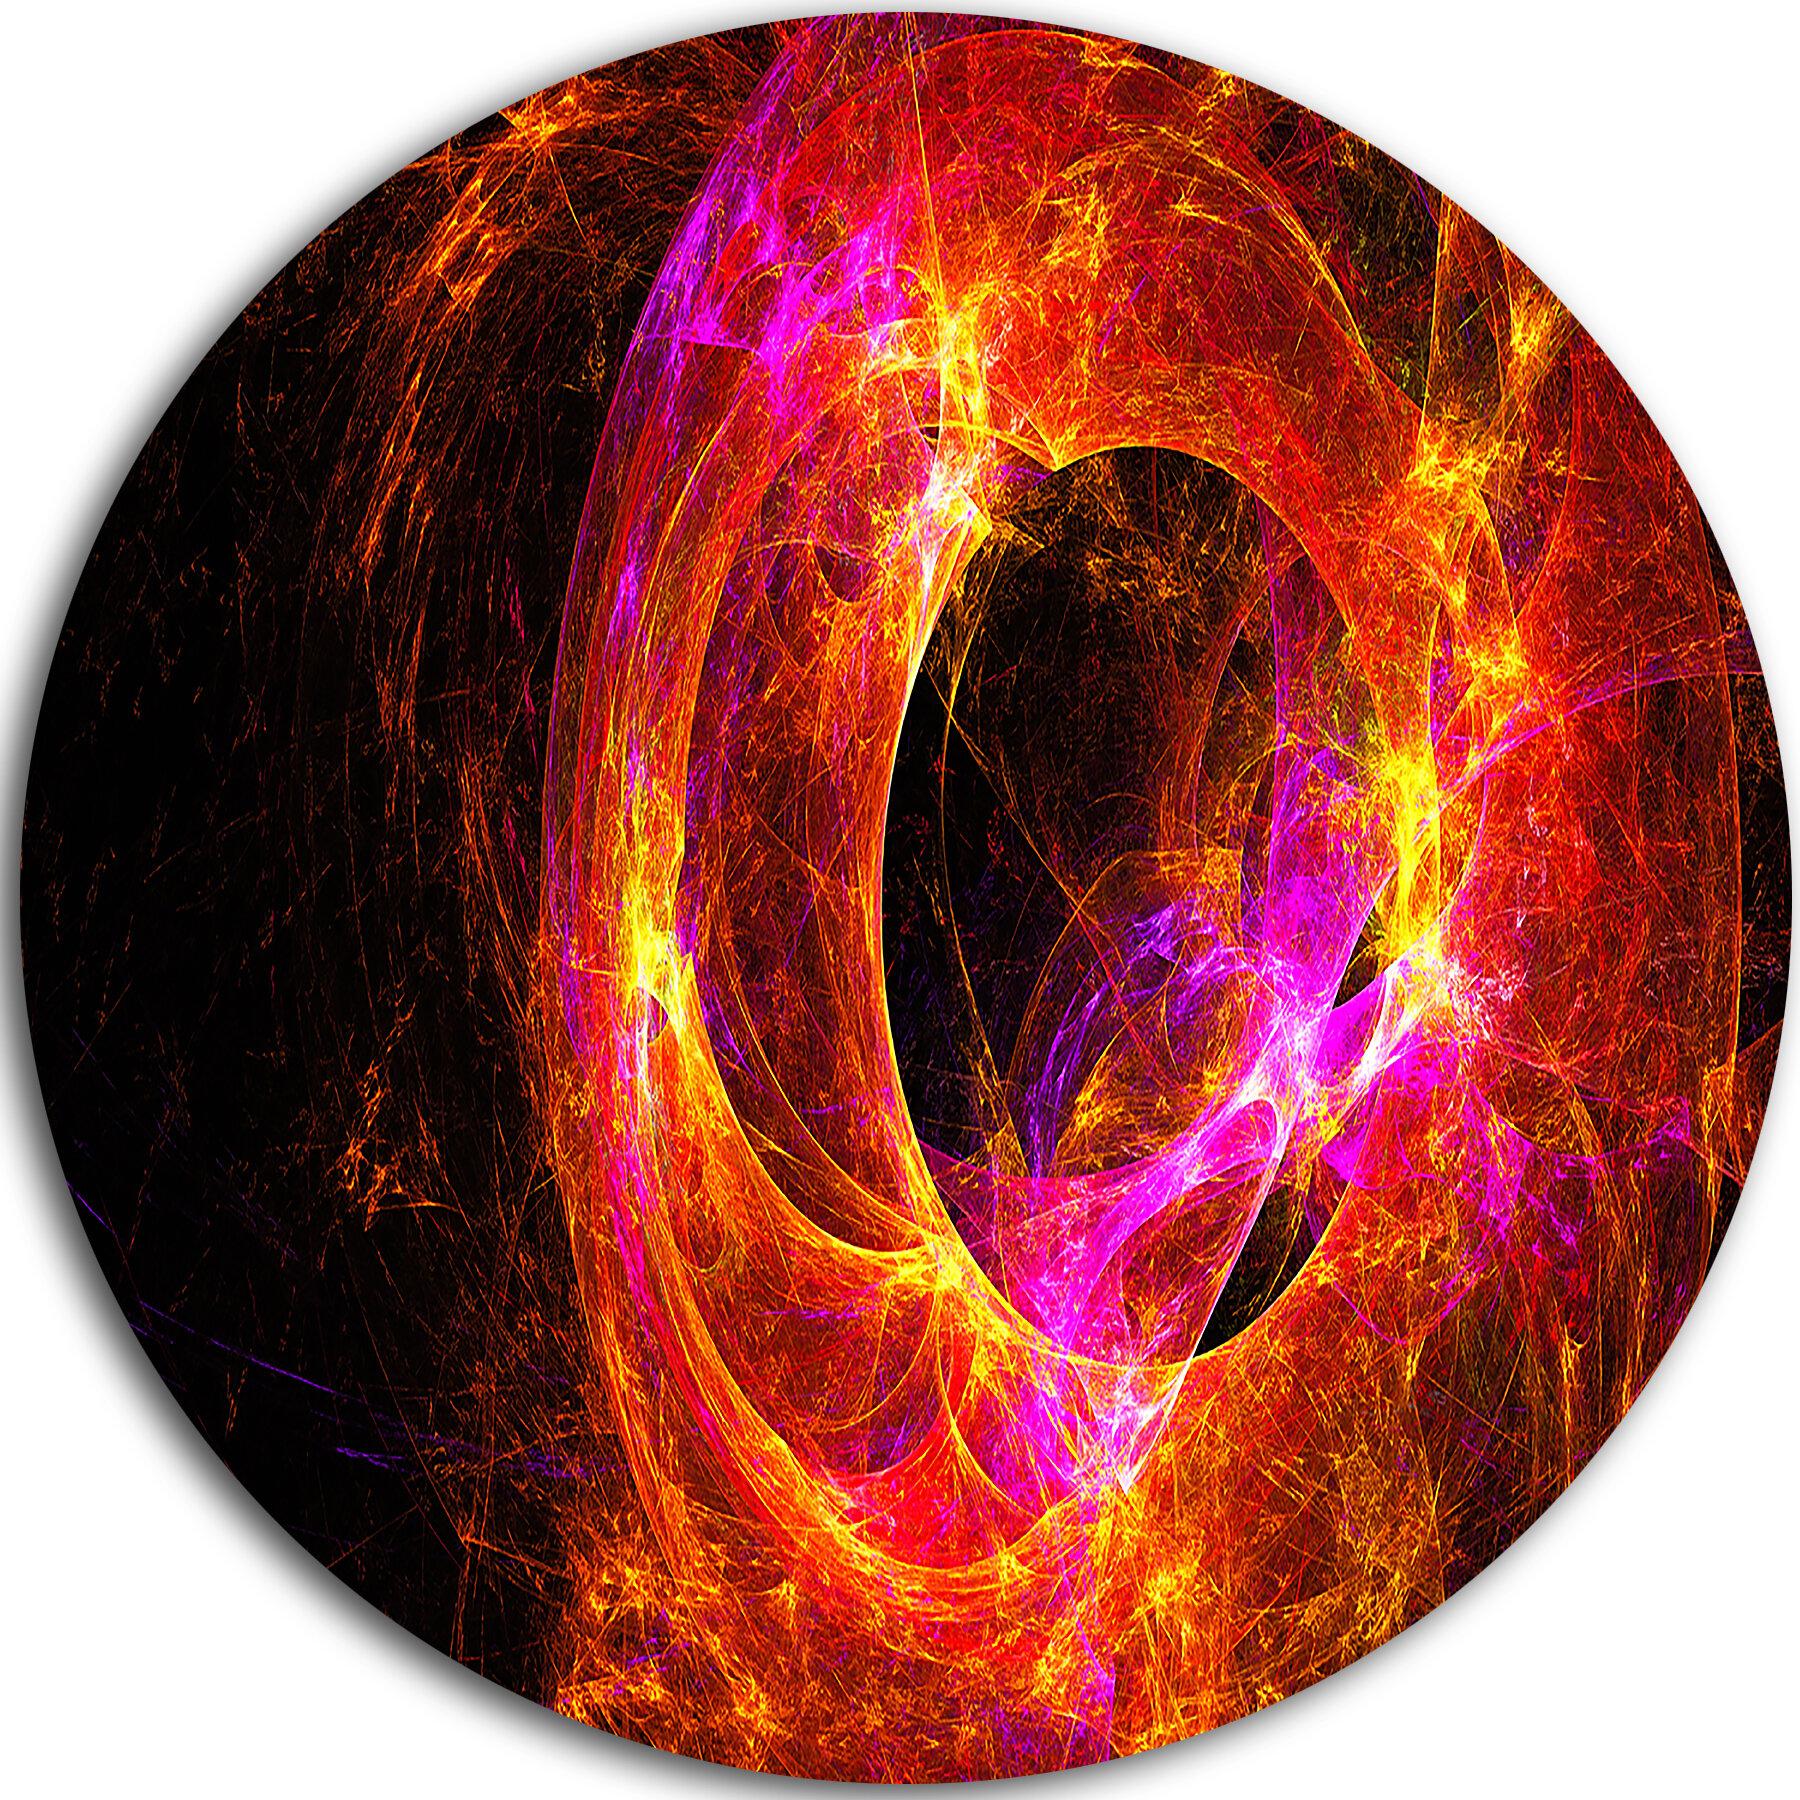 Designart Far Spherical Galaxy Red Graphic Art Print On Metal Wayfair